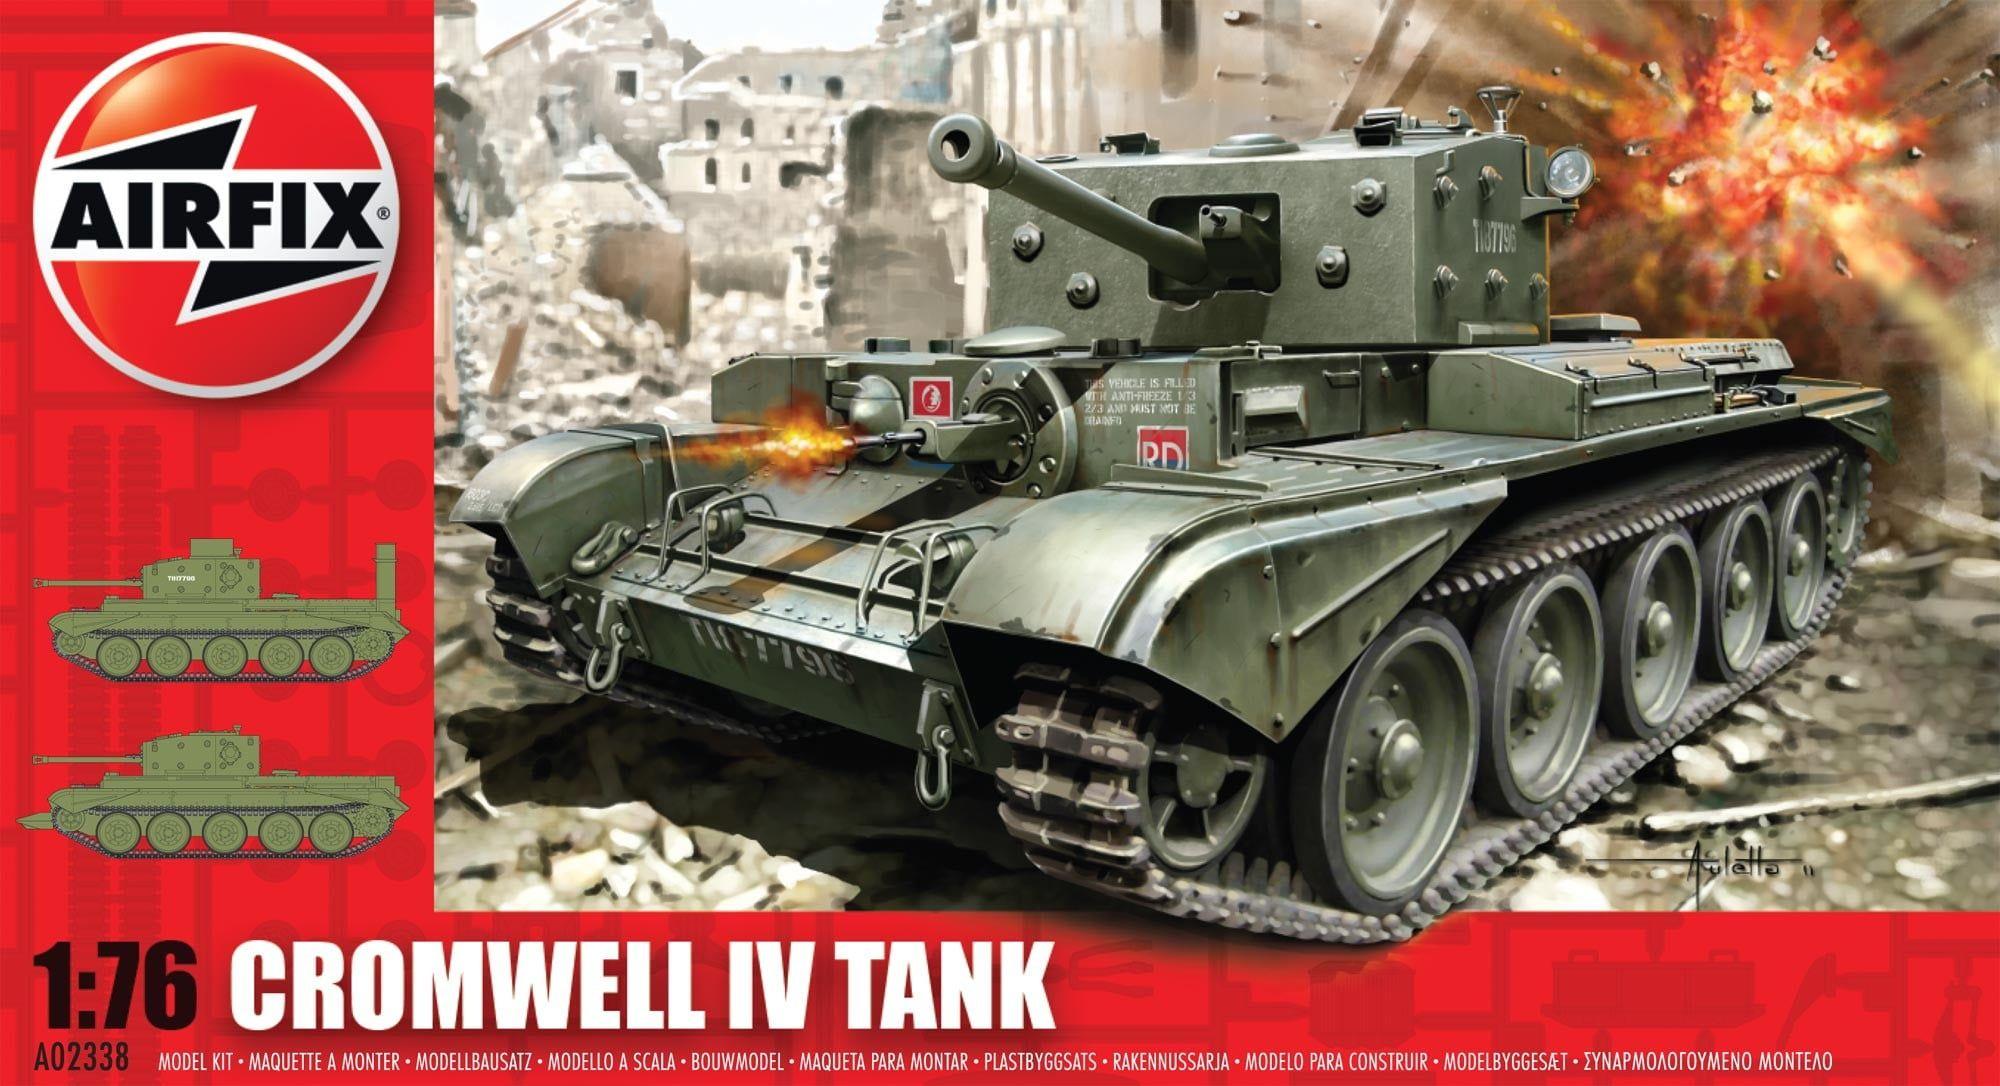 Airfix Cromwell IV Tank 1:76